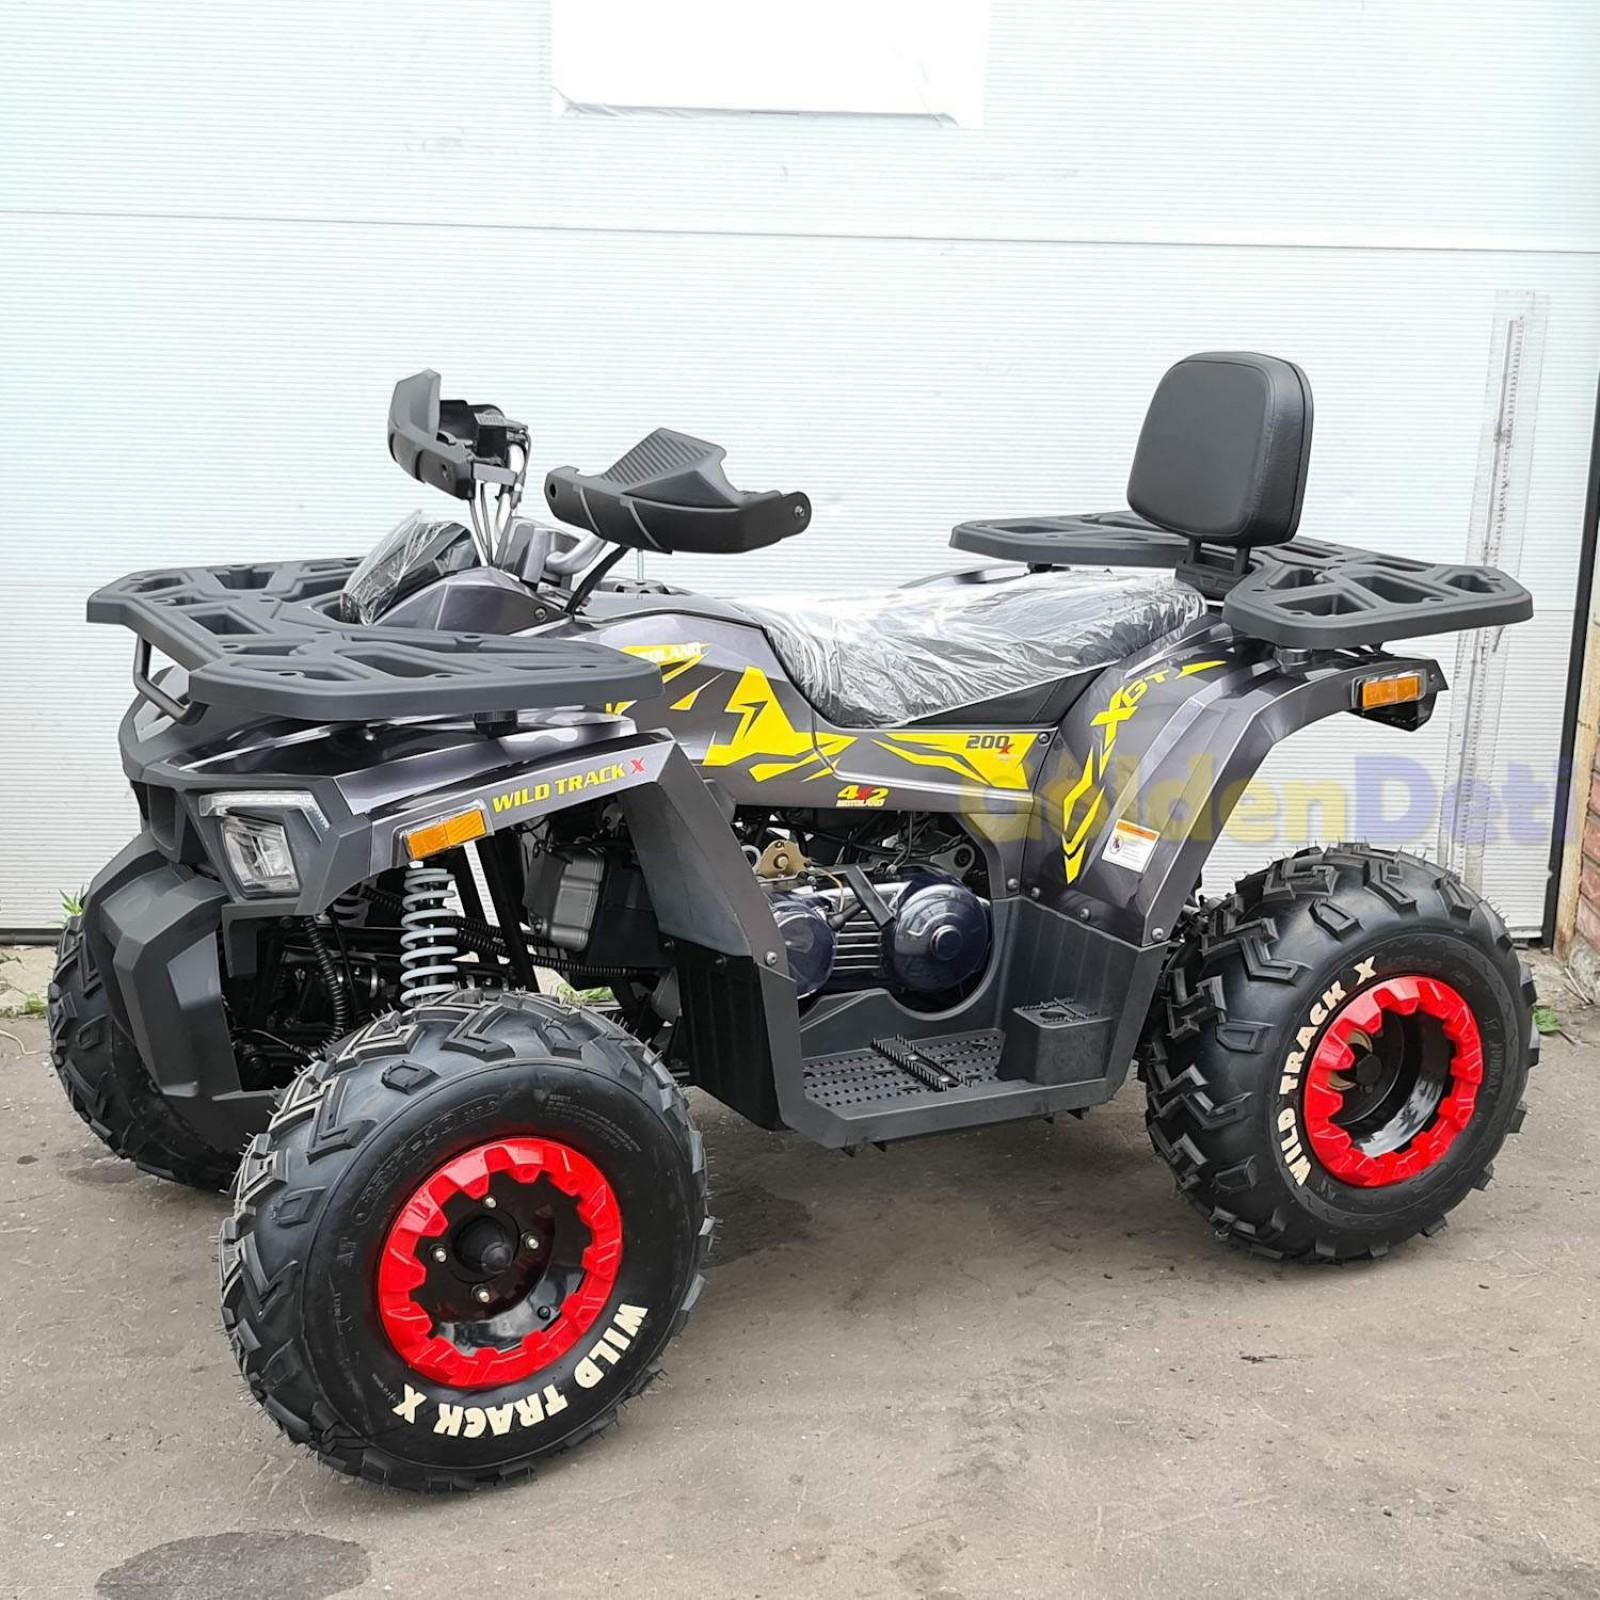 Квадроцикл MotoLand 200 WILD TRACK X 2020 года